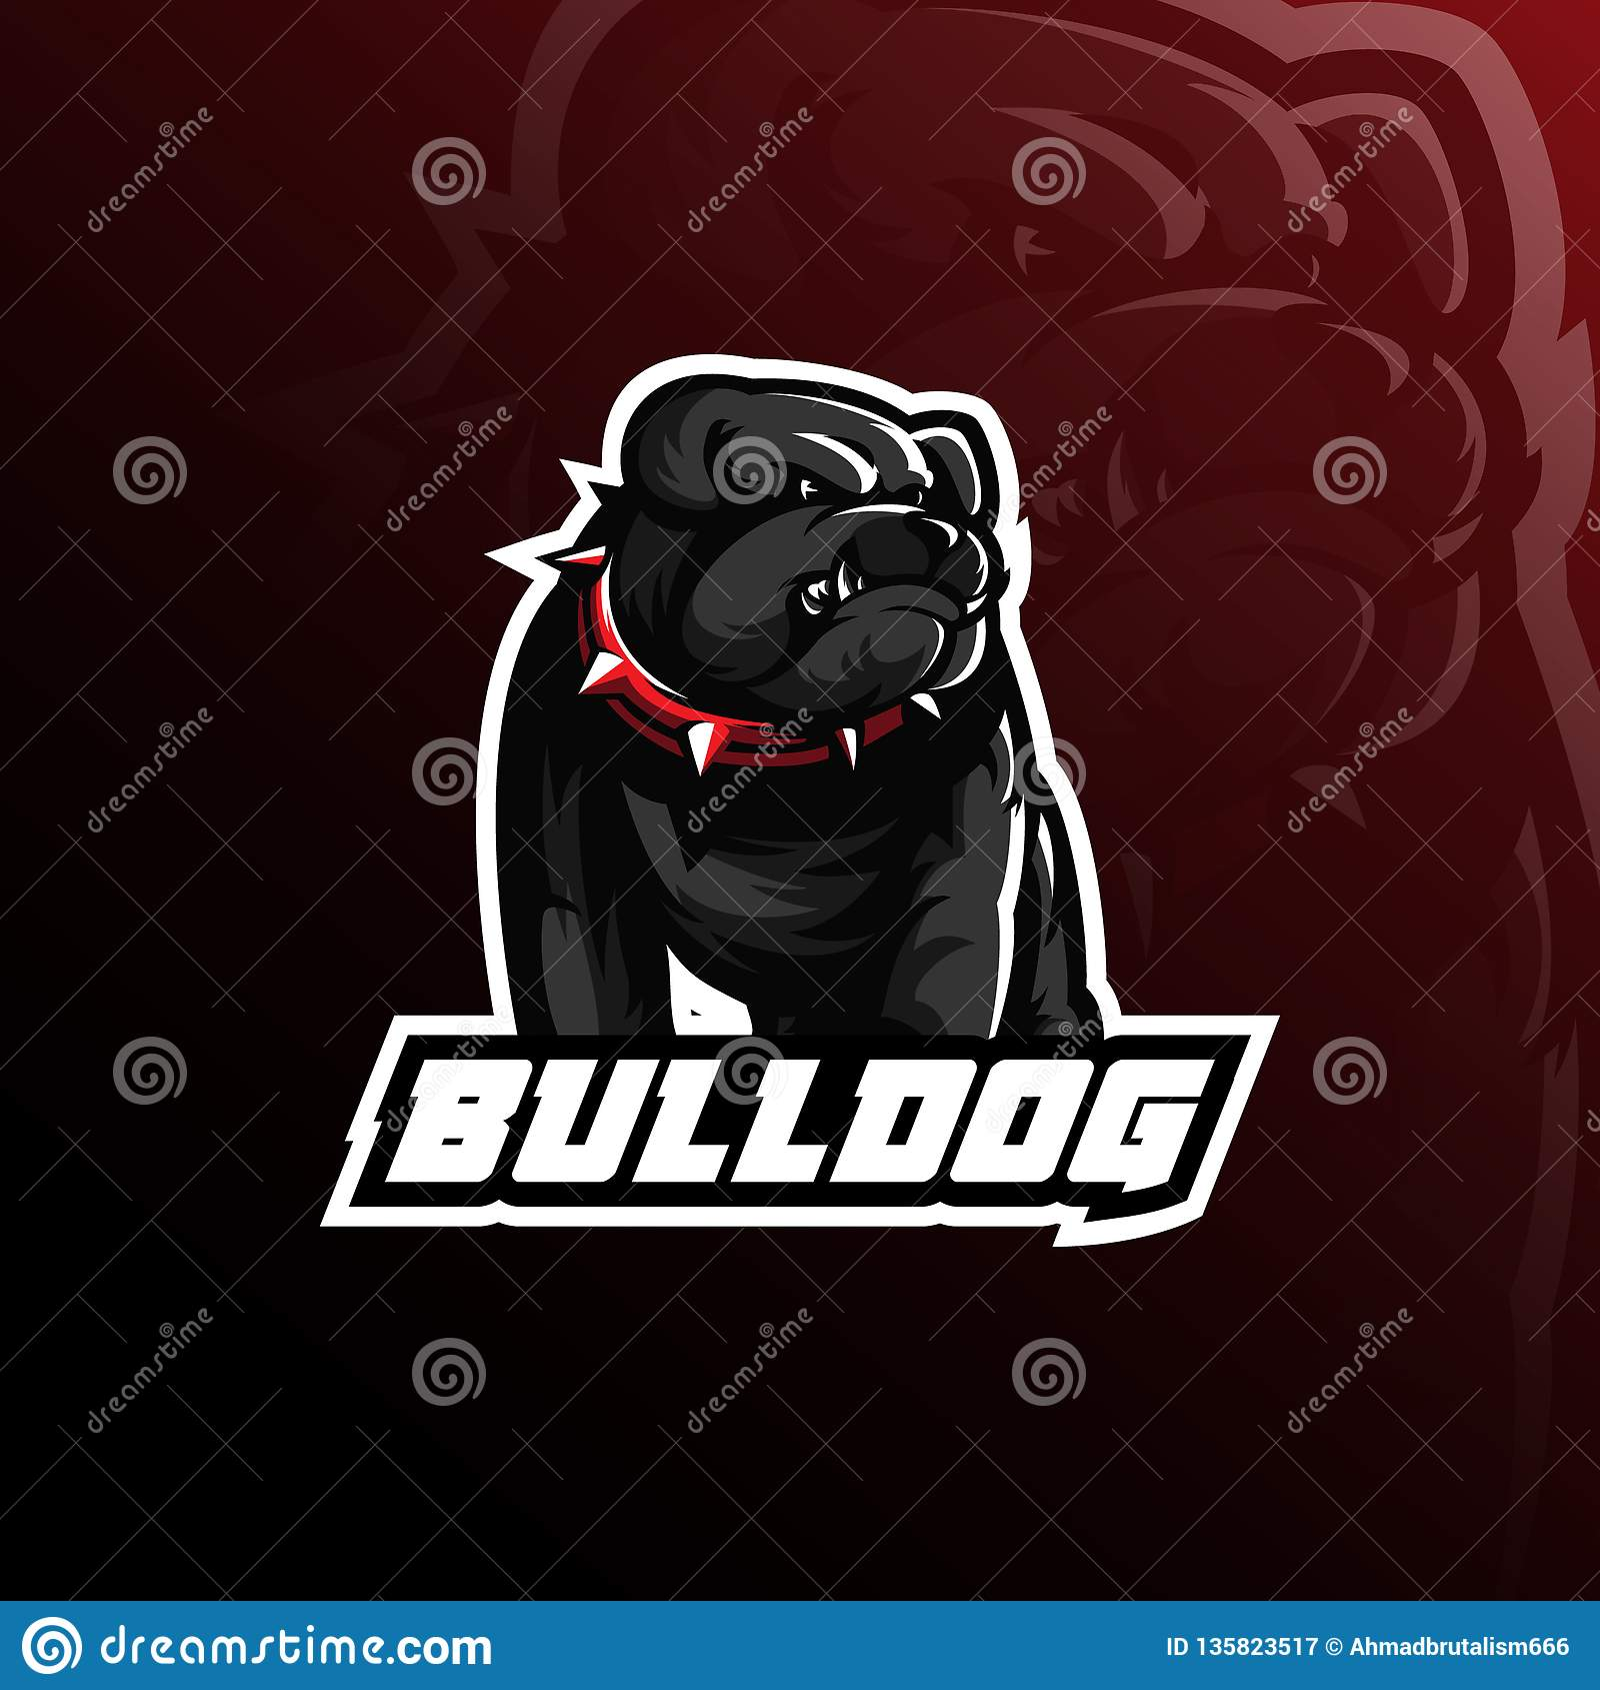 Bulldog vector mascot logo design with modern illustration concept style for badge, emblem and tshirt printing. angry bulldog